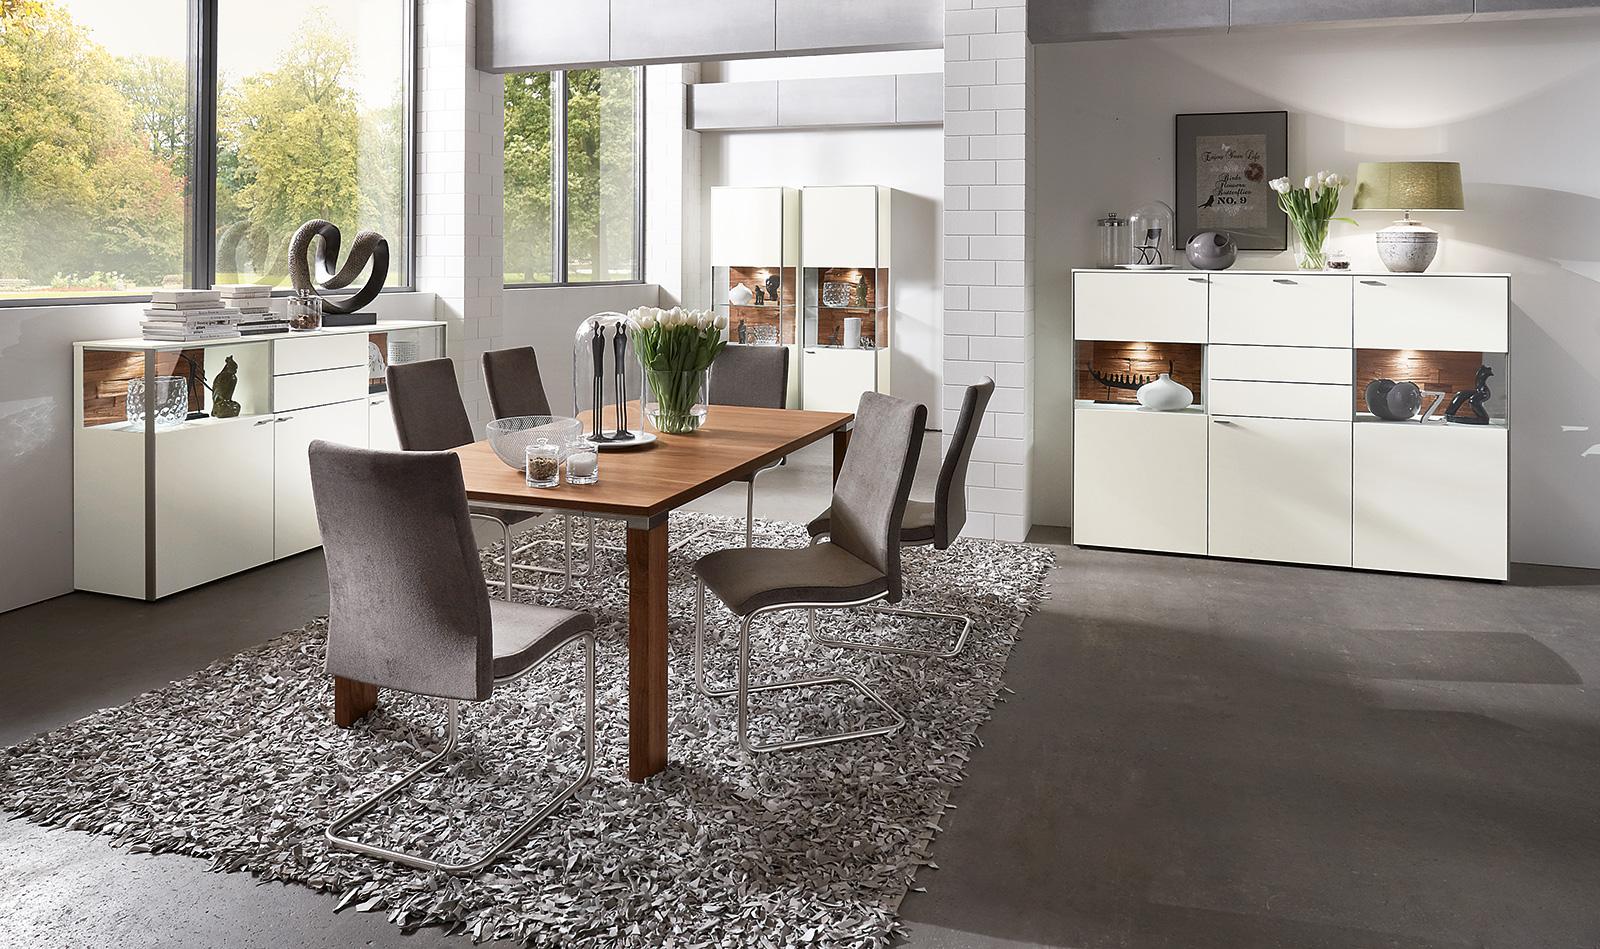 esszimmer programme sentino venjakob m bel vorsprung durch design und qualit t. Black Bedroom Furniture Sets. Home Design Ideas